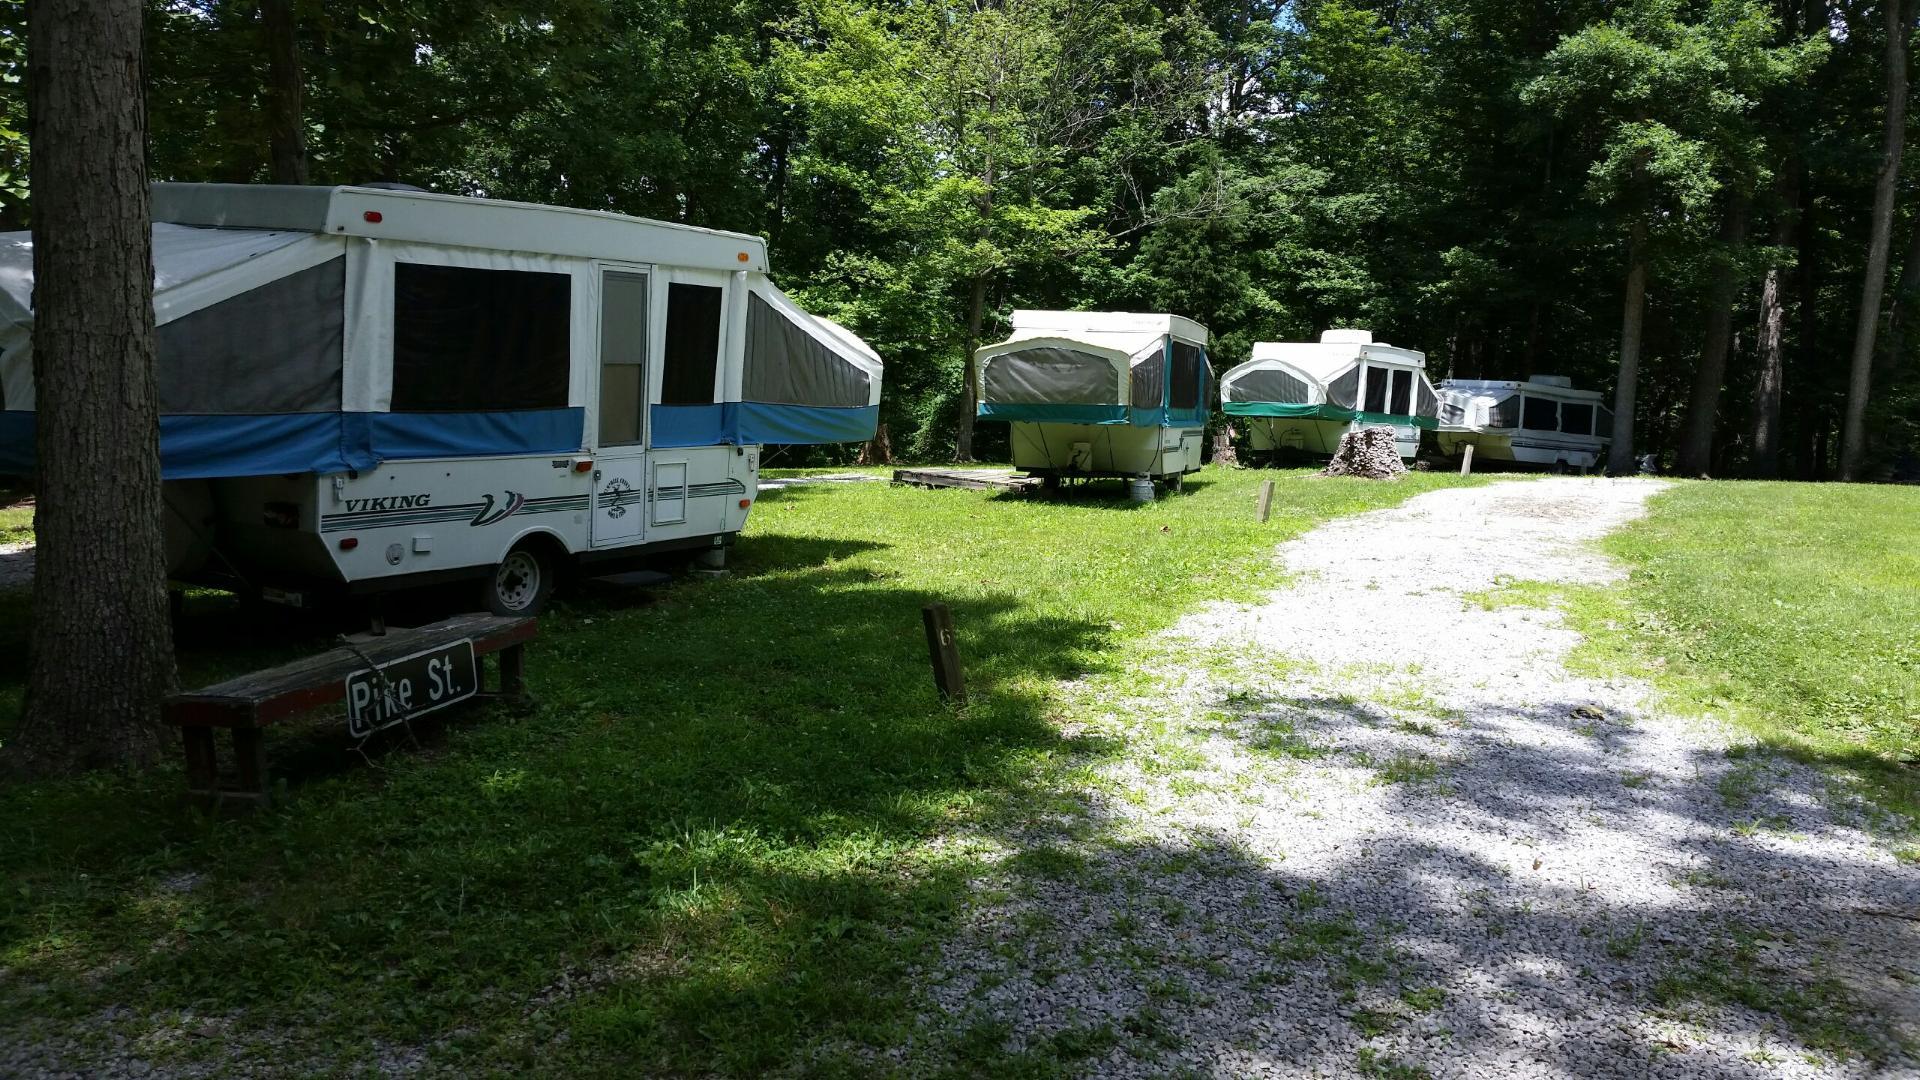 96 Rv Camping Wallpaper Rv Camping White Mou Rv